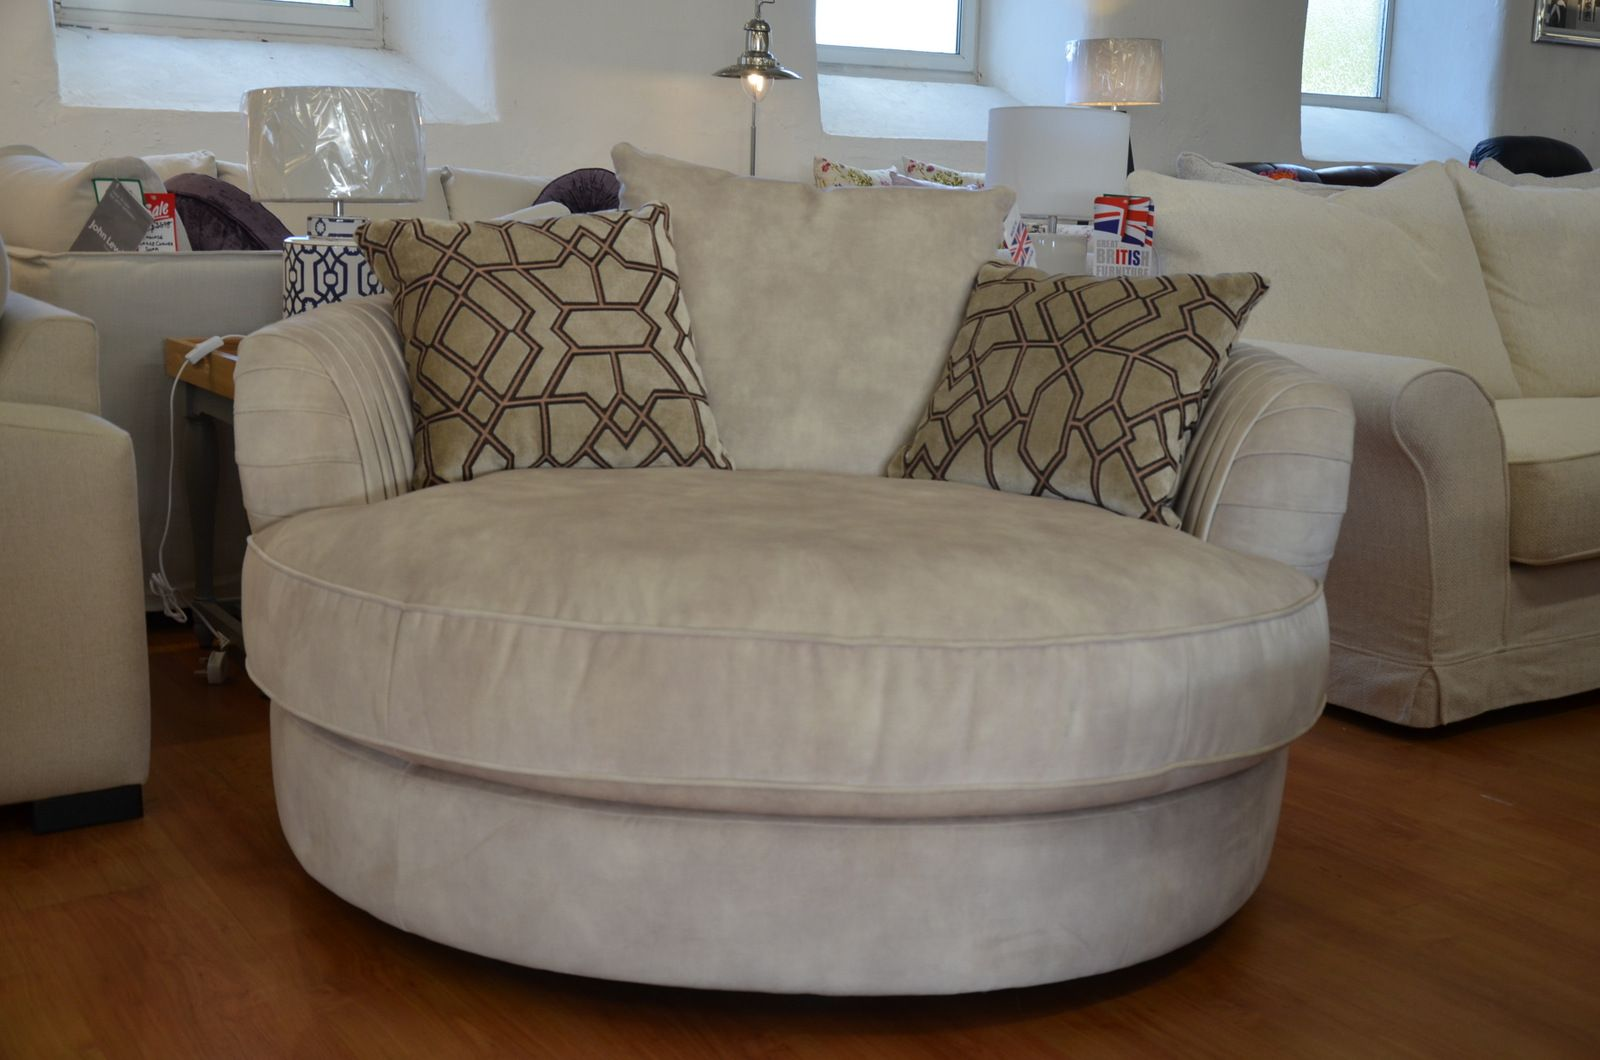 Prototype Large Round Swivel Chair Snuggler